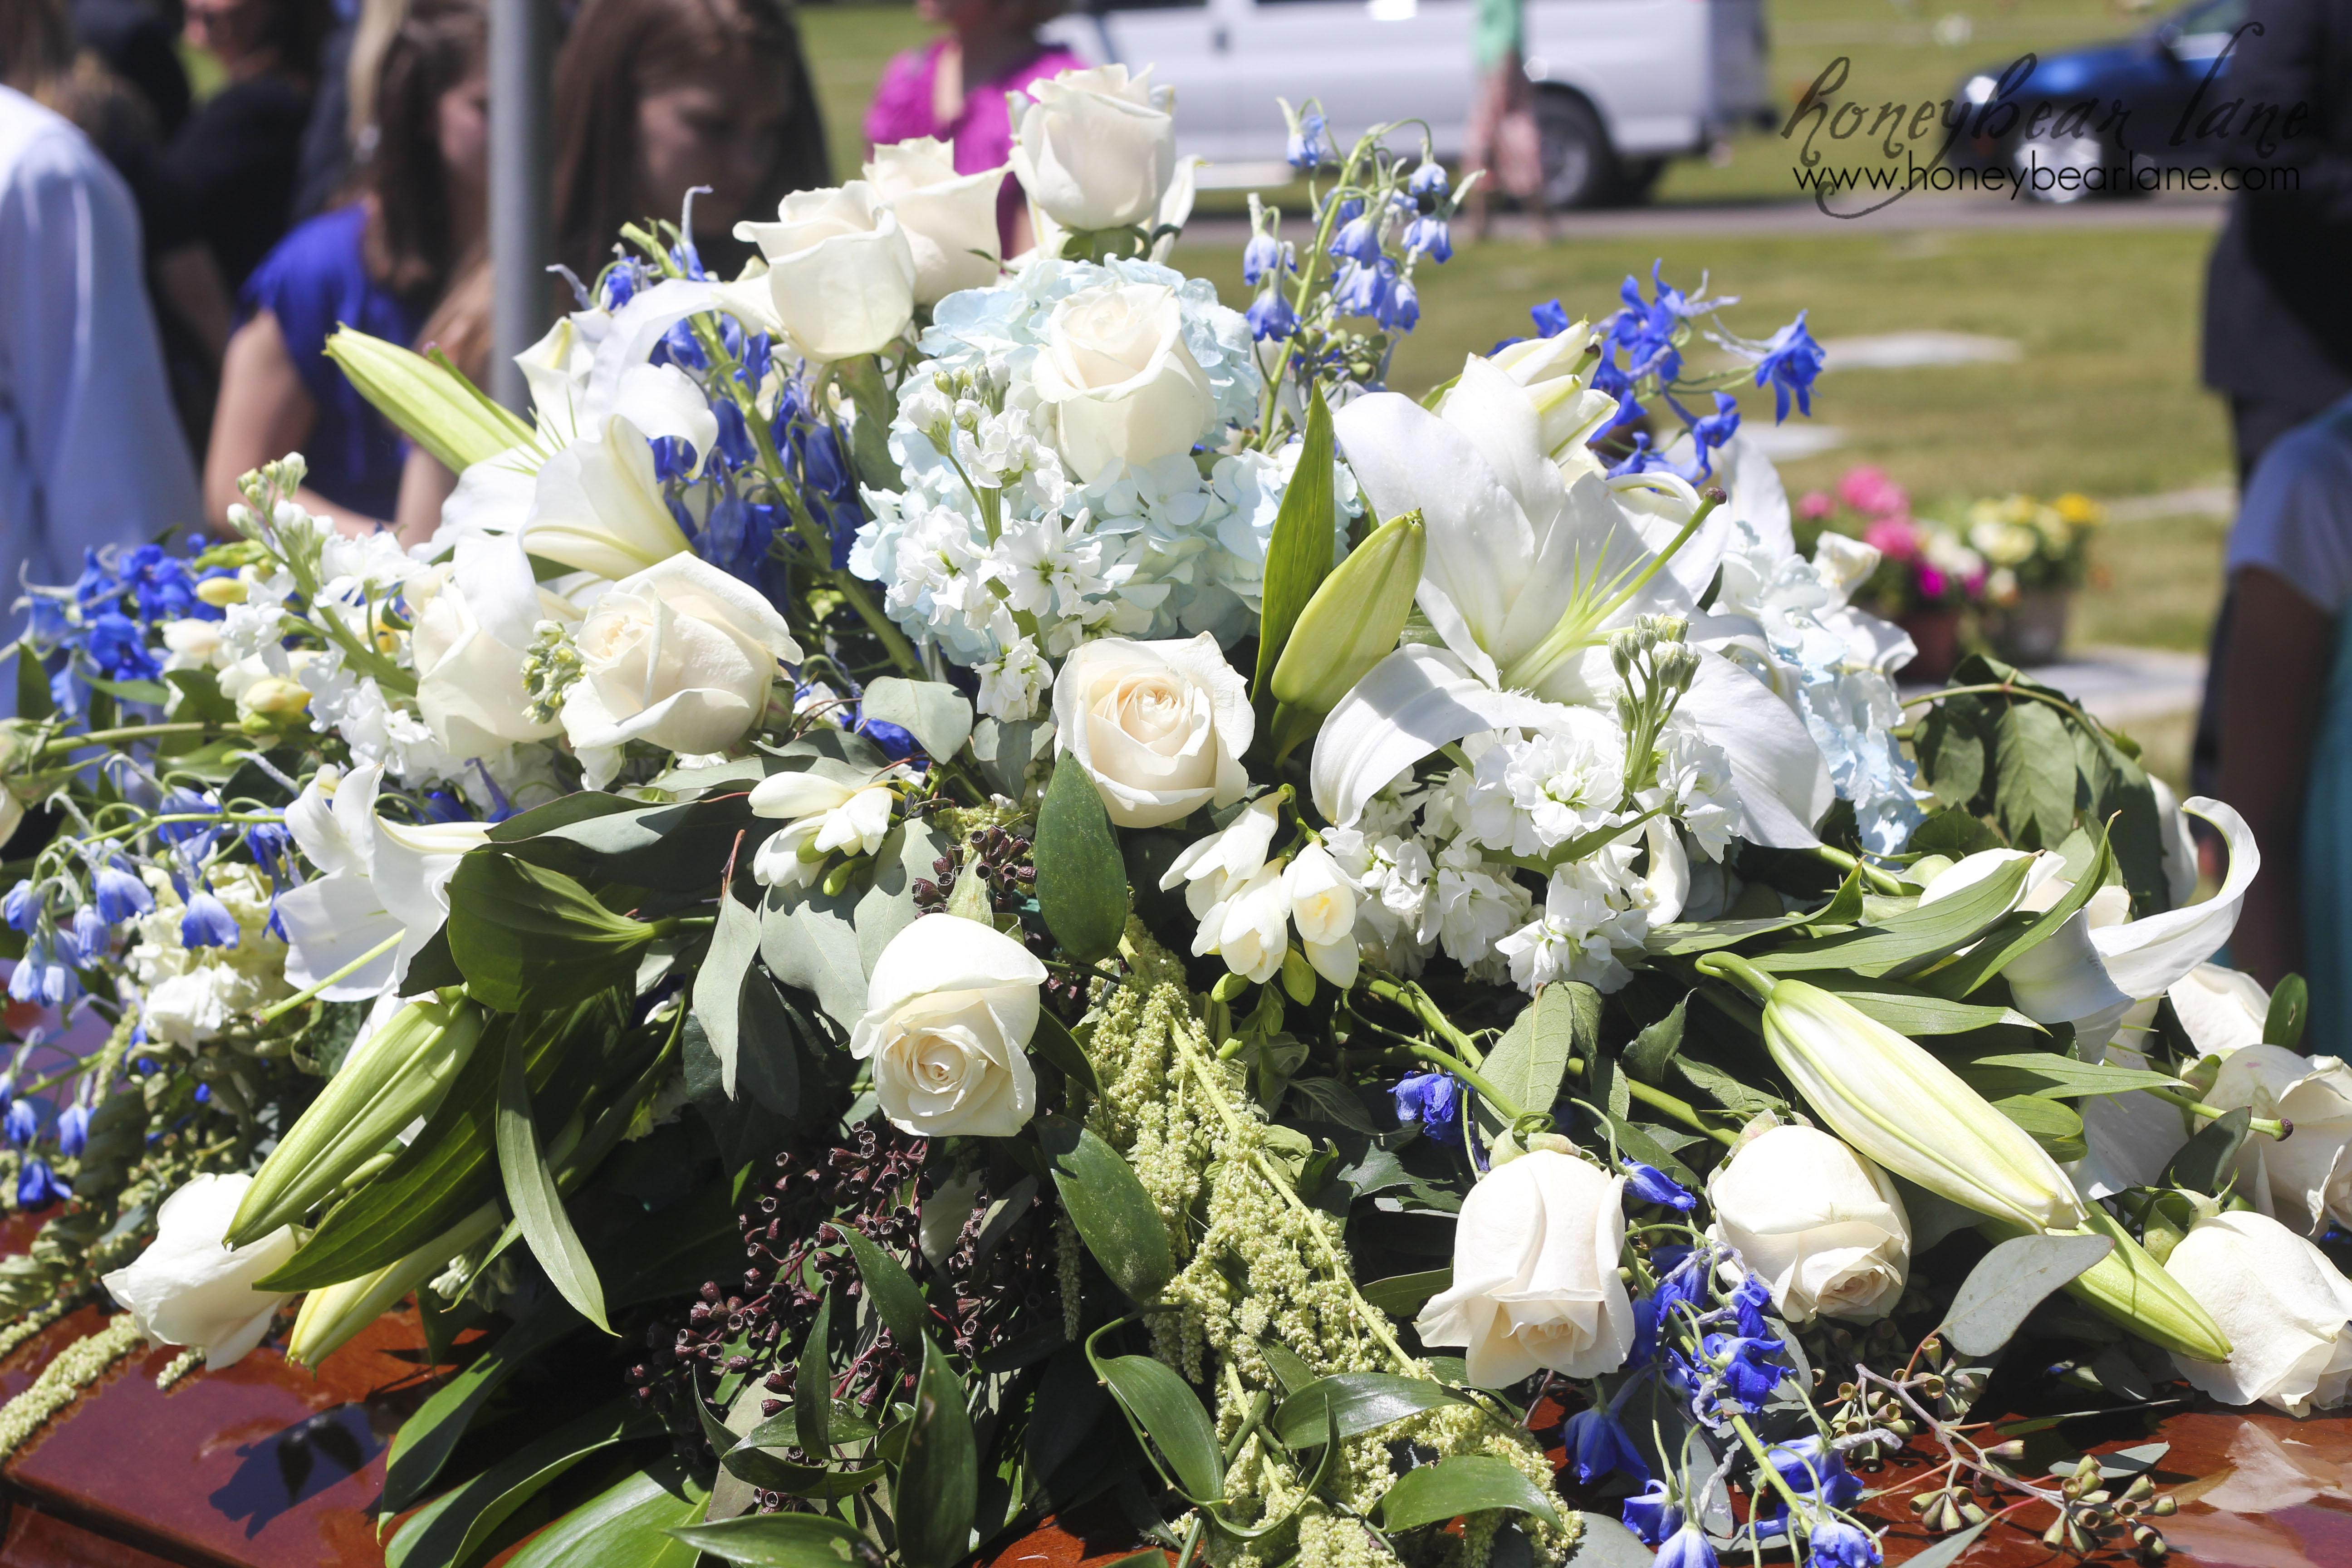 Alices Funeral Goodbye Temporarily Honeybear Lane